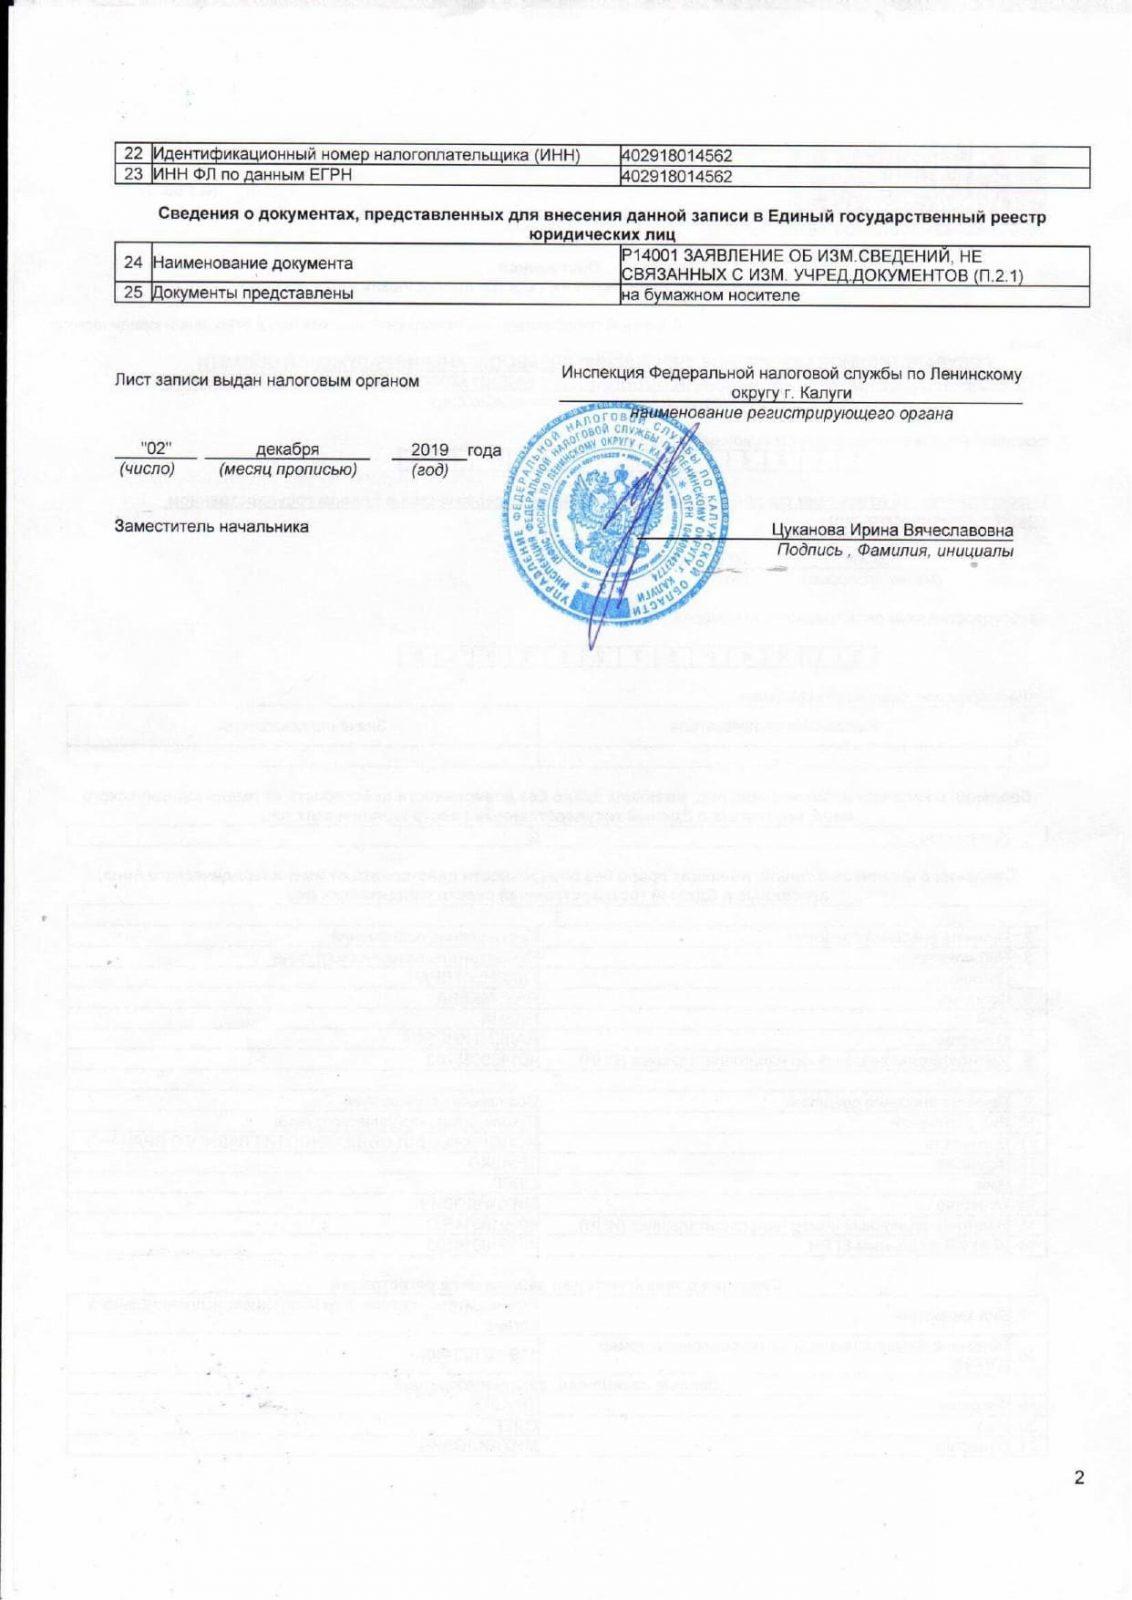 list-zapisi-ot-29.11.2019-poslednij_page-0002